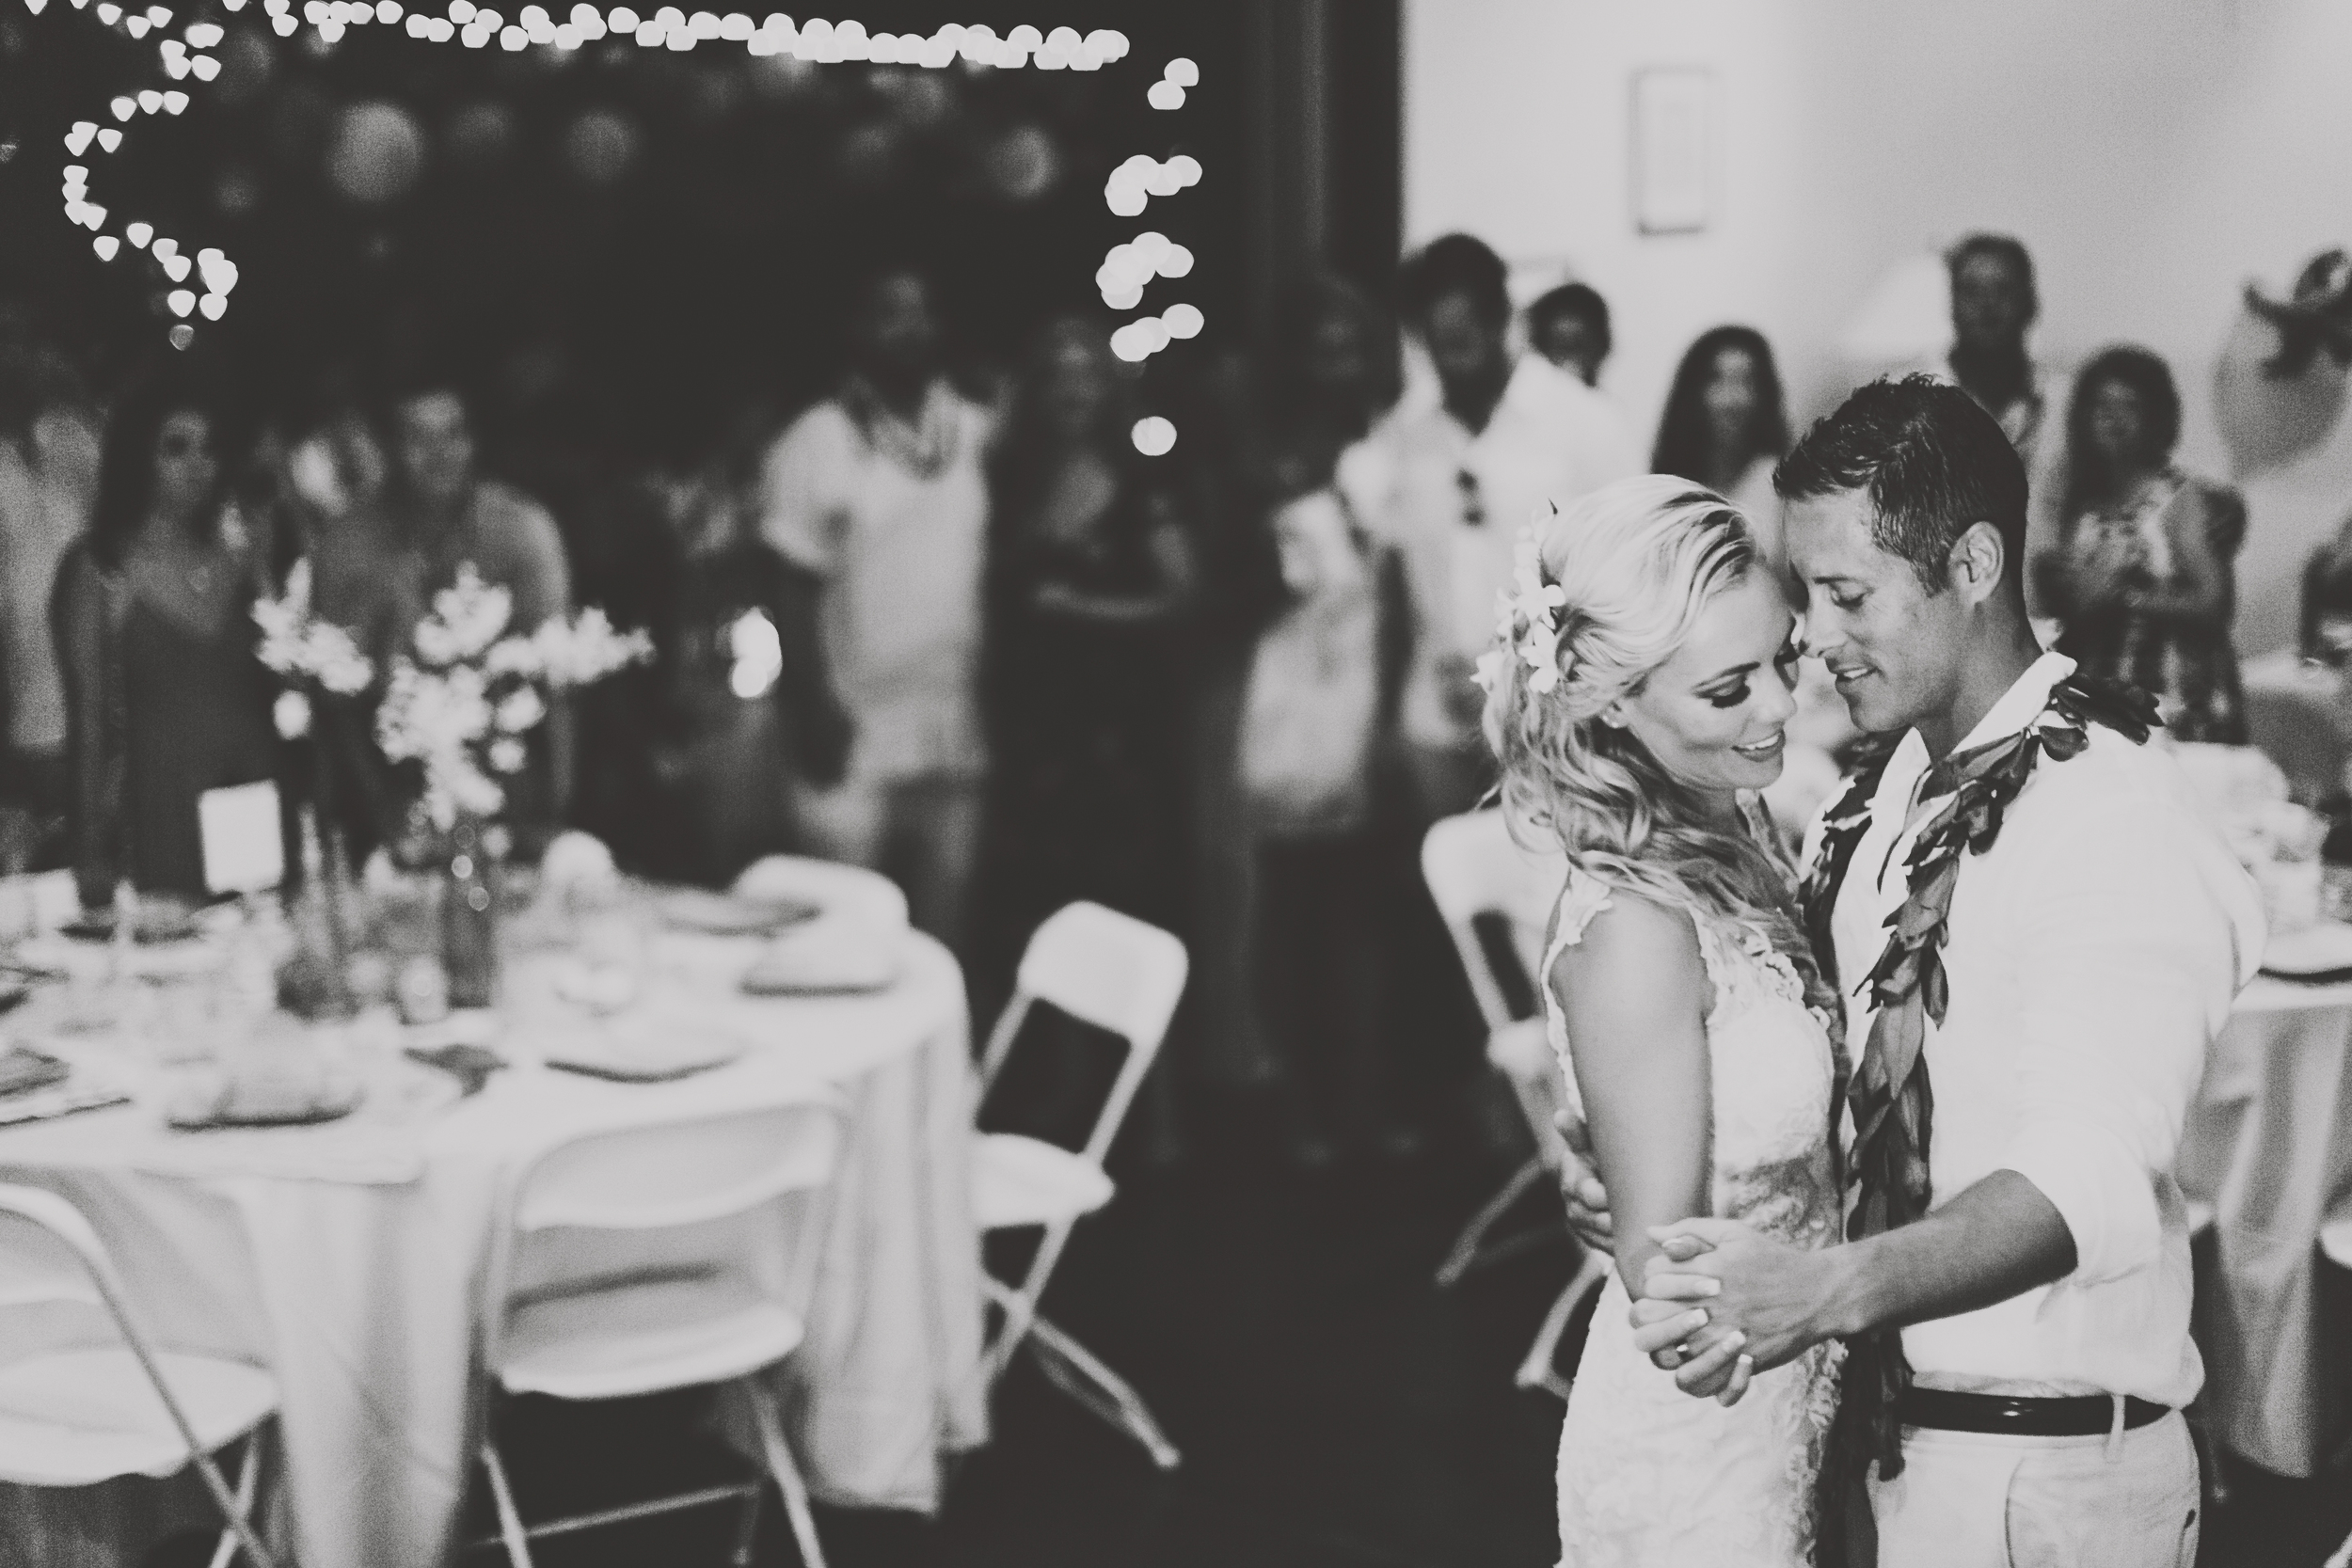 angie-diaz-photography-hawaii-wedding-photographer-kelli-jay-120.jpg